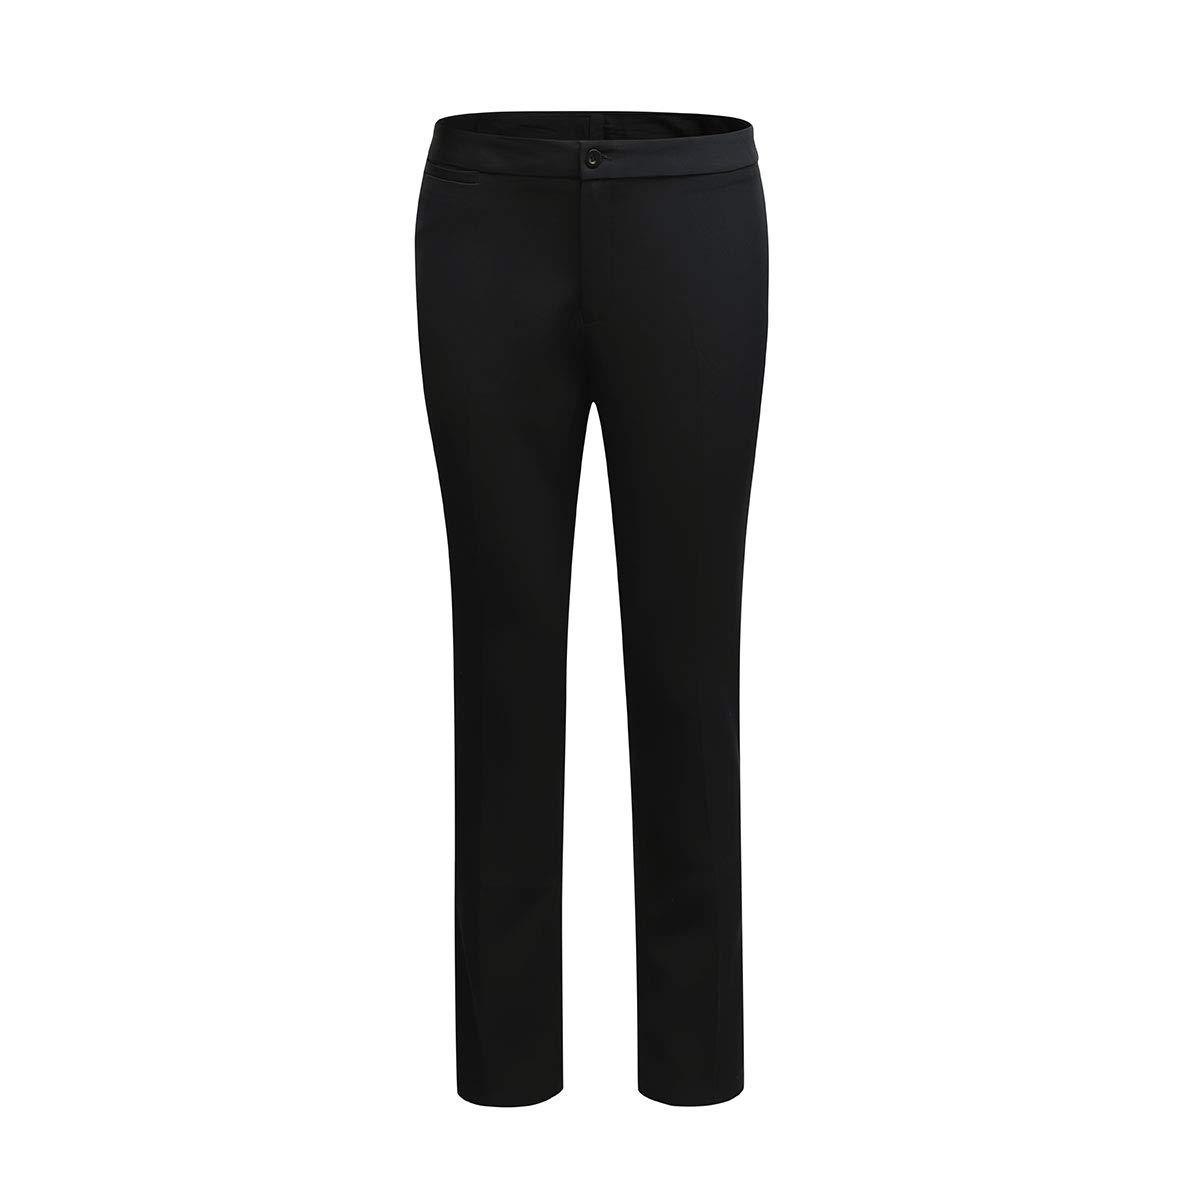 Womens Business Office 1 Button Blazer Jacket and Pants Suit Set